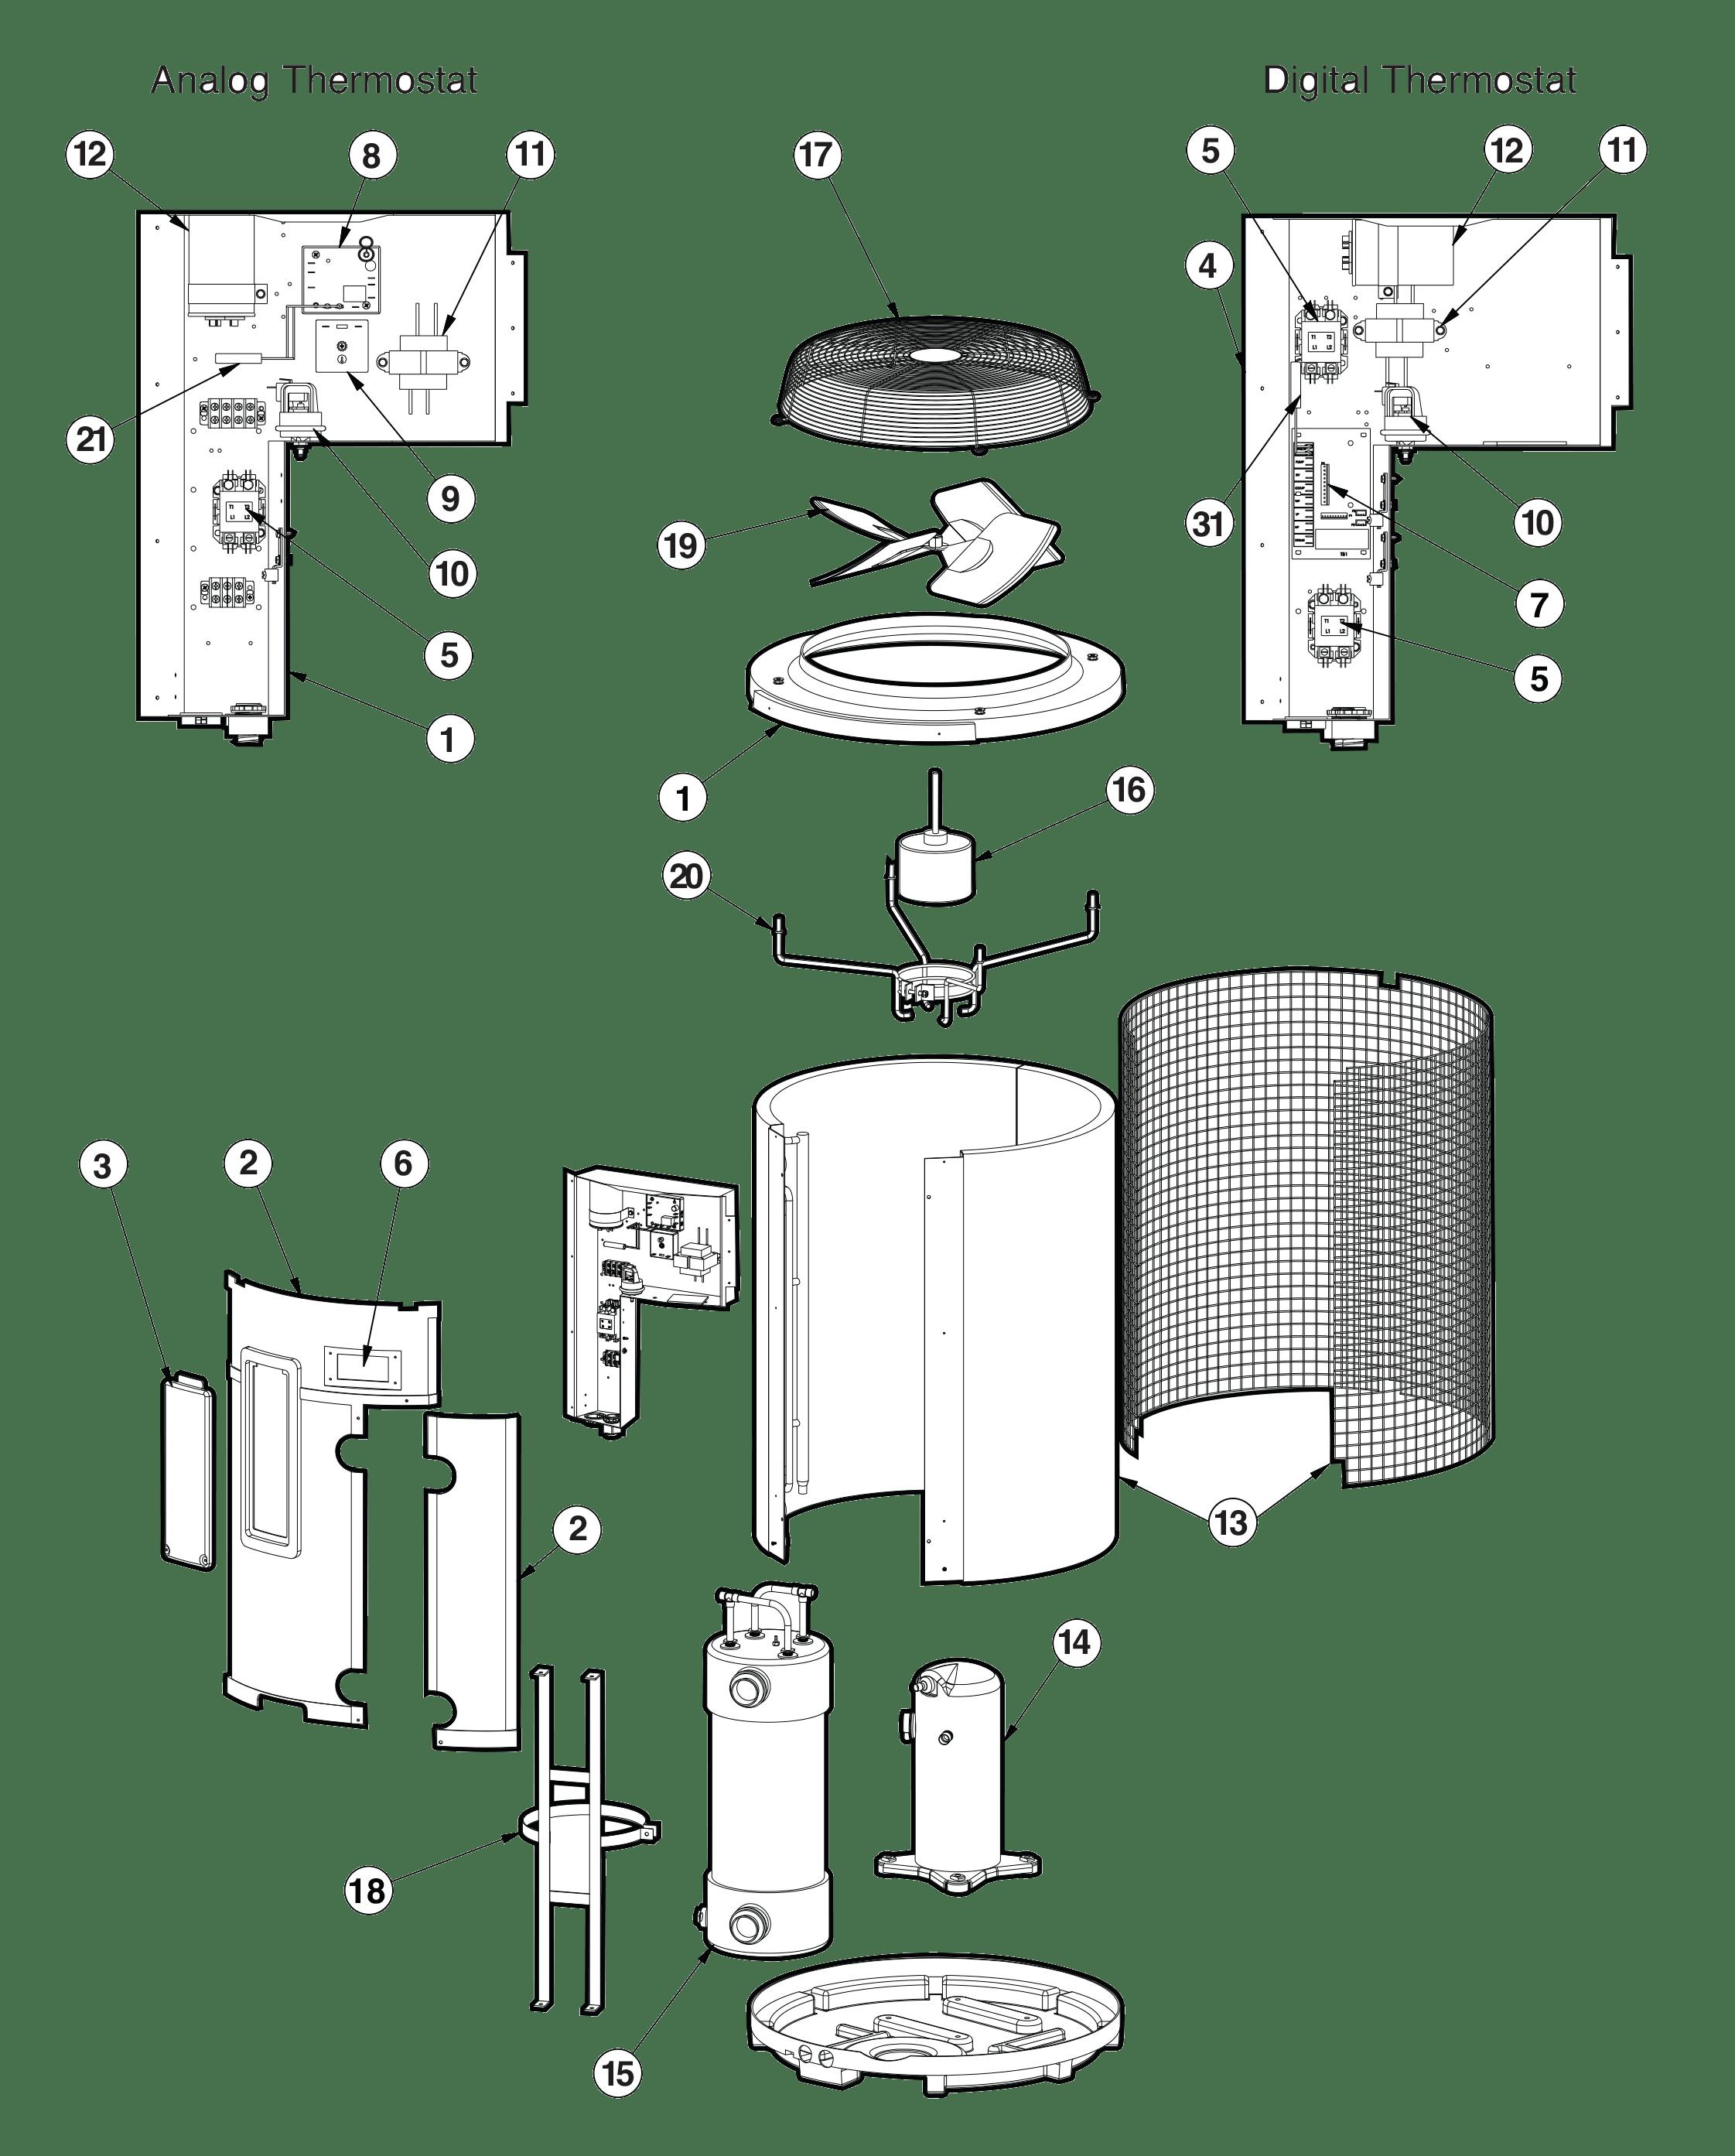 Jacuzzi Aero Spa Electrical Schematic